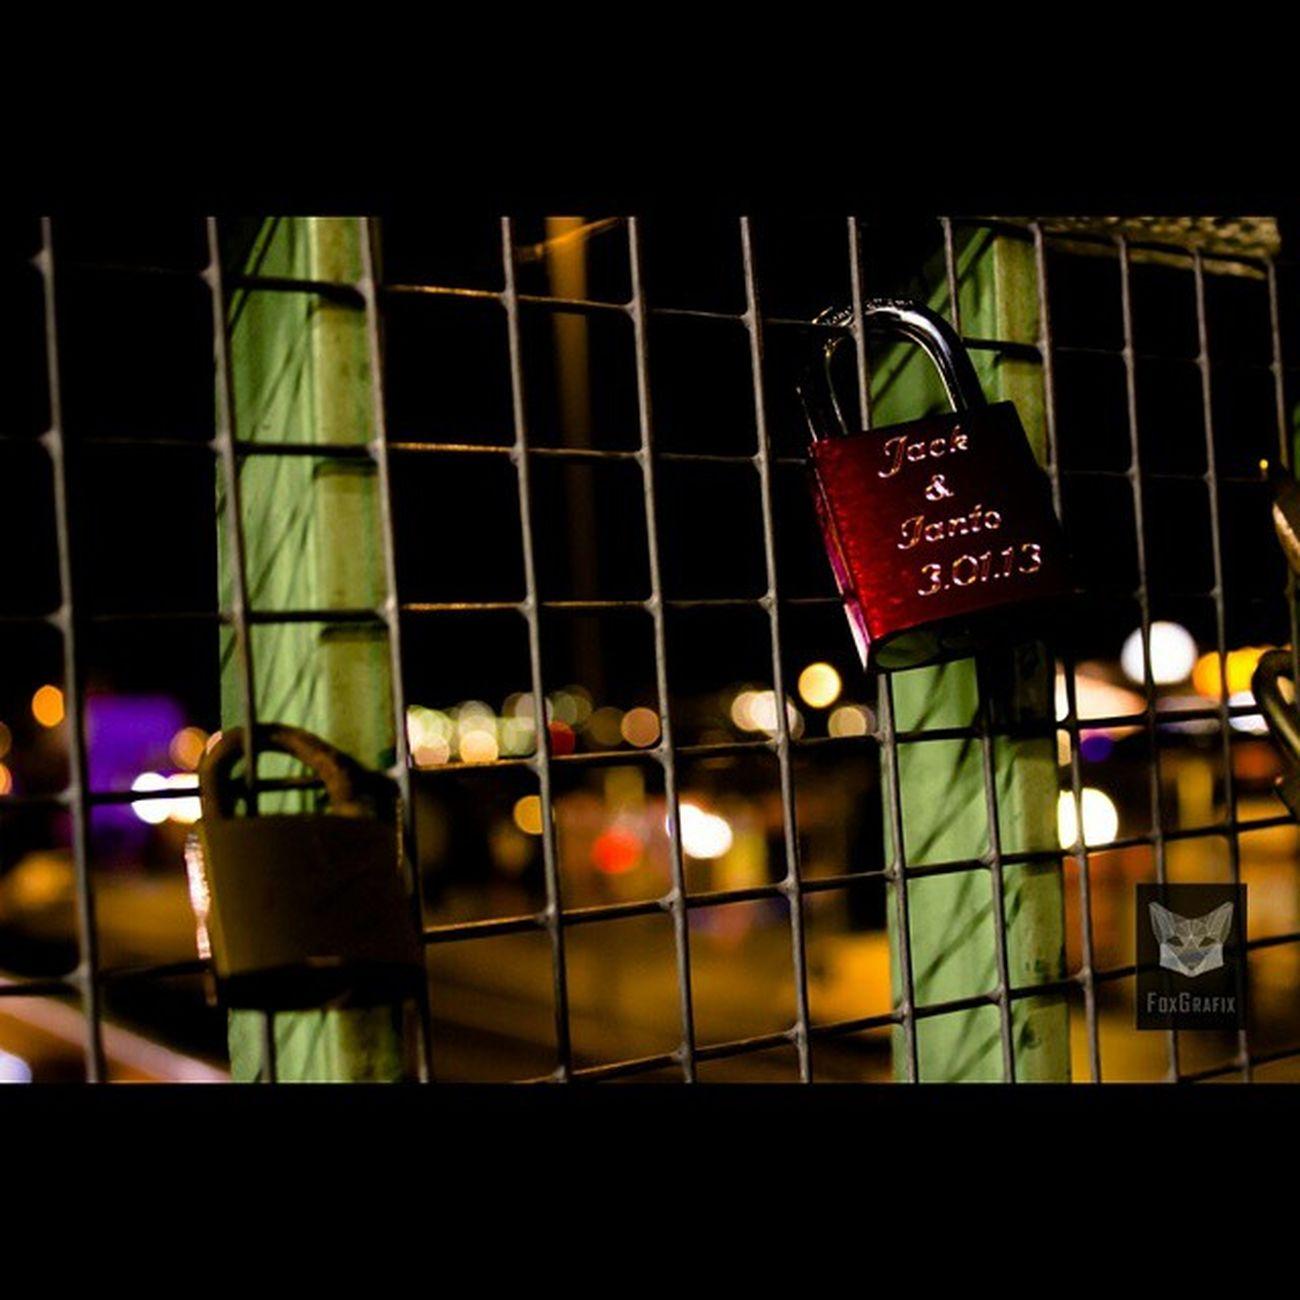 Schloss Jack + Ianto / Padlock Jack + Ianto Landungsbrücken Hamburg Hamburg Fotografie Torchwood Janto Iantojones Jackharkness Captainjackharkness Landungsbrücken  Padlock